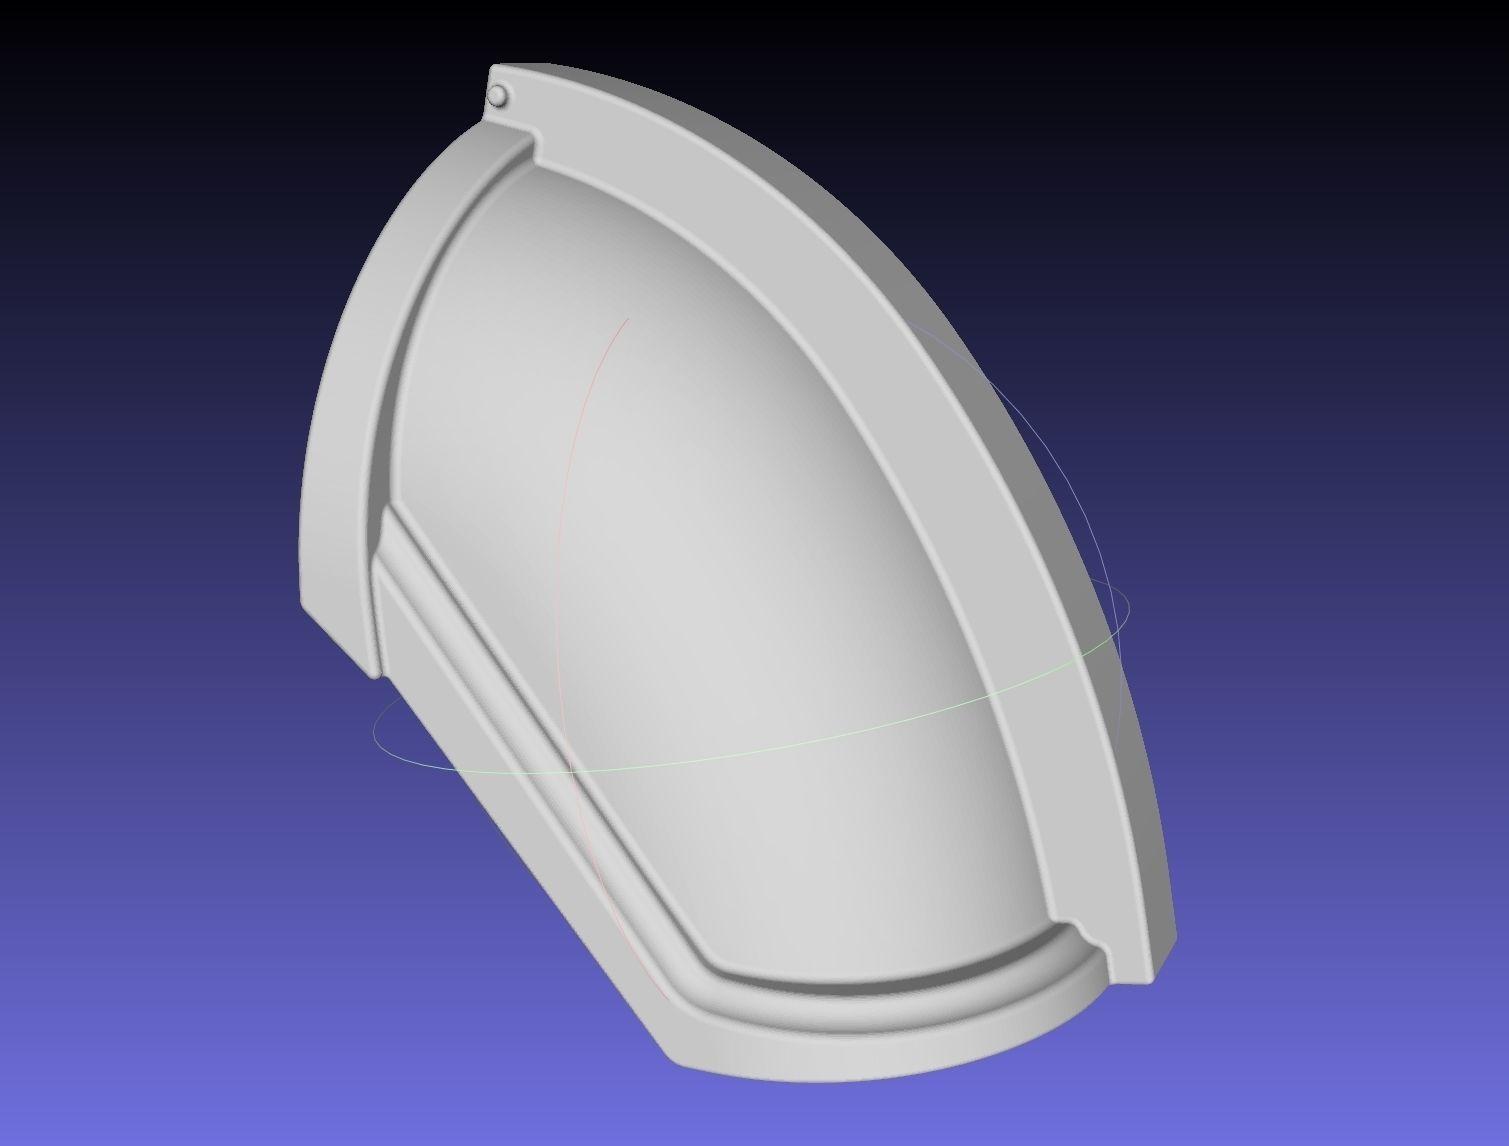 Star Wars Mandalorian Chrome Armor Shoulderpiece Printable